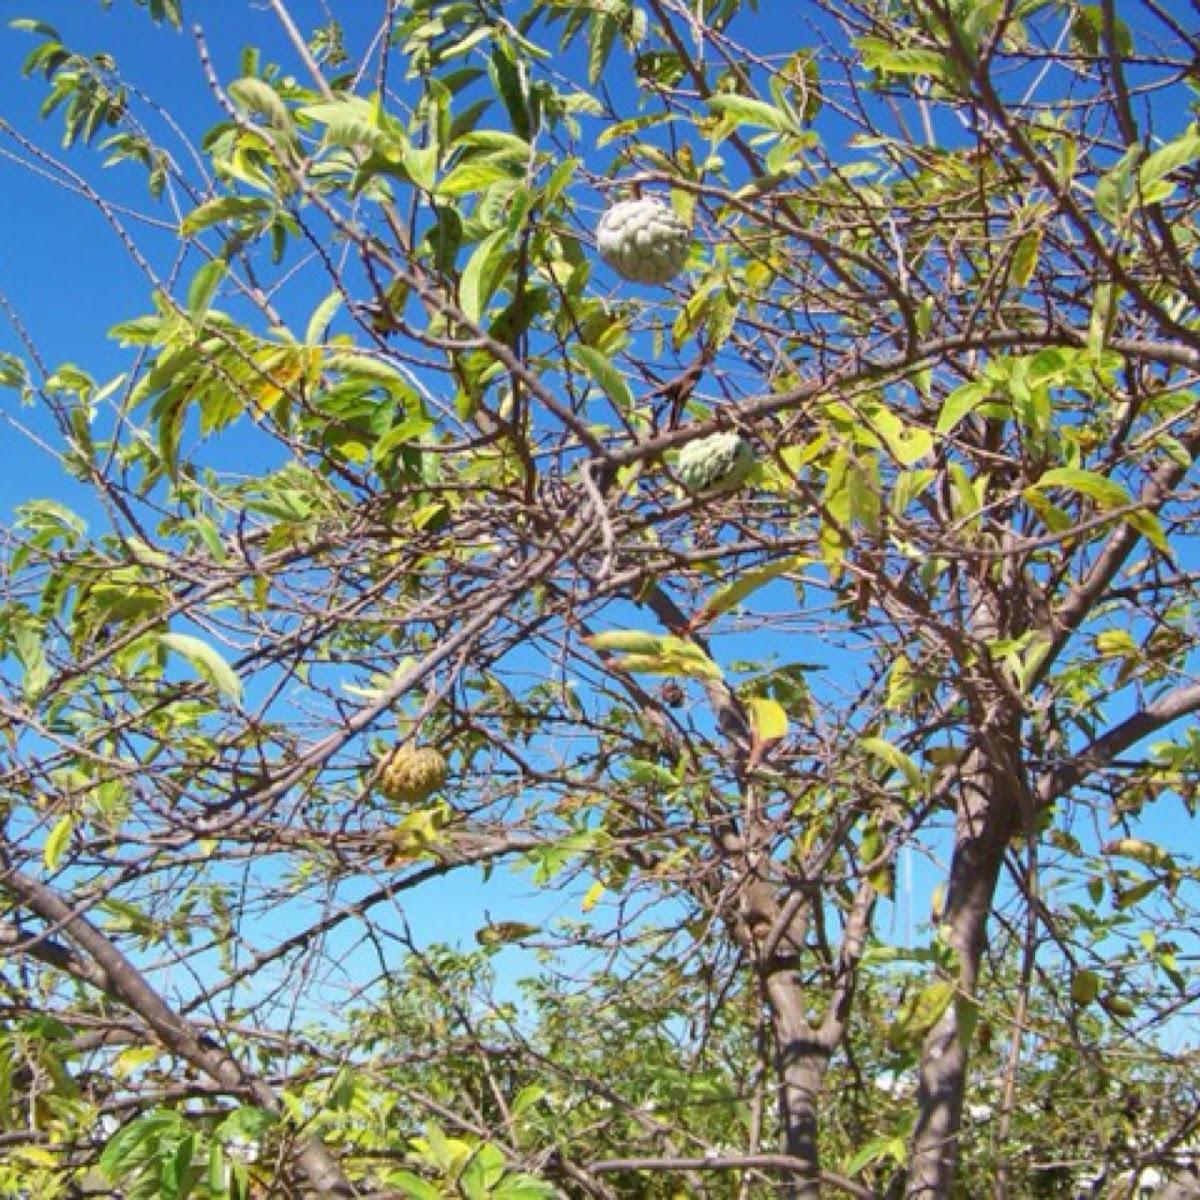 Saramuyo or sugar_apple